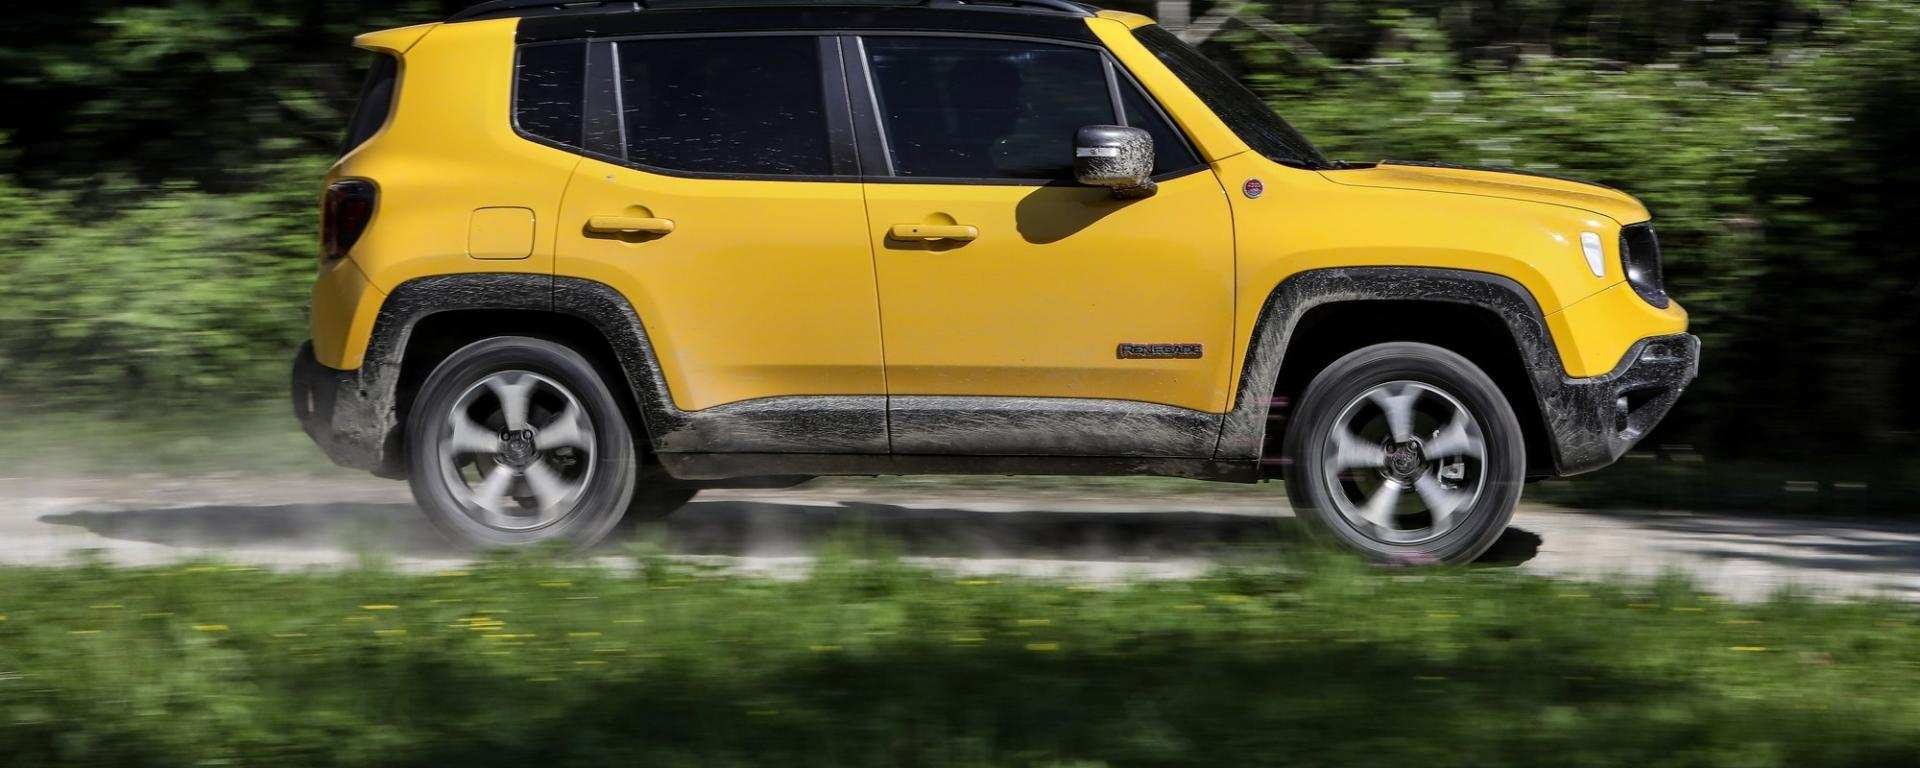 66 New Jeep Nuovi Modelli 2020 Specs with Jeep Nuovi Modelli 2020